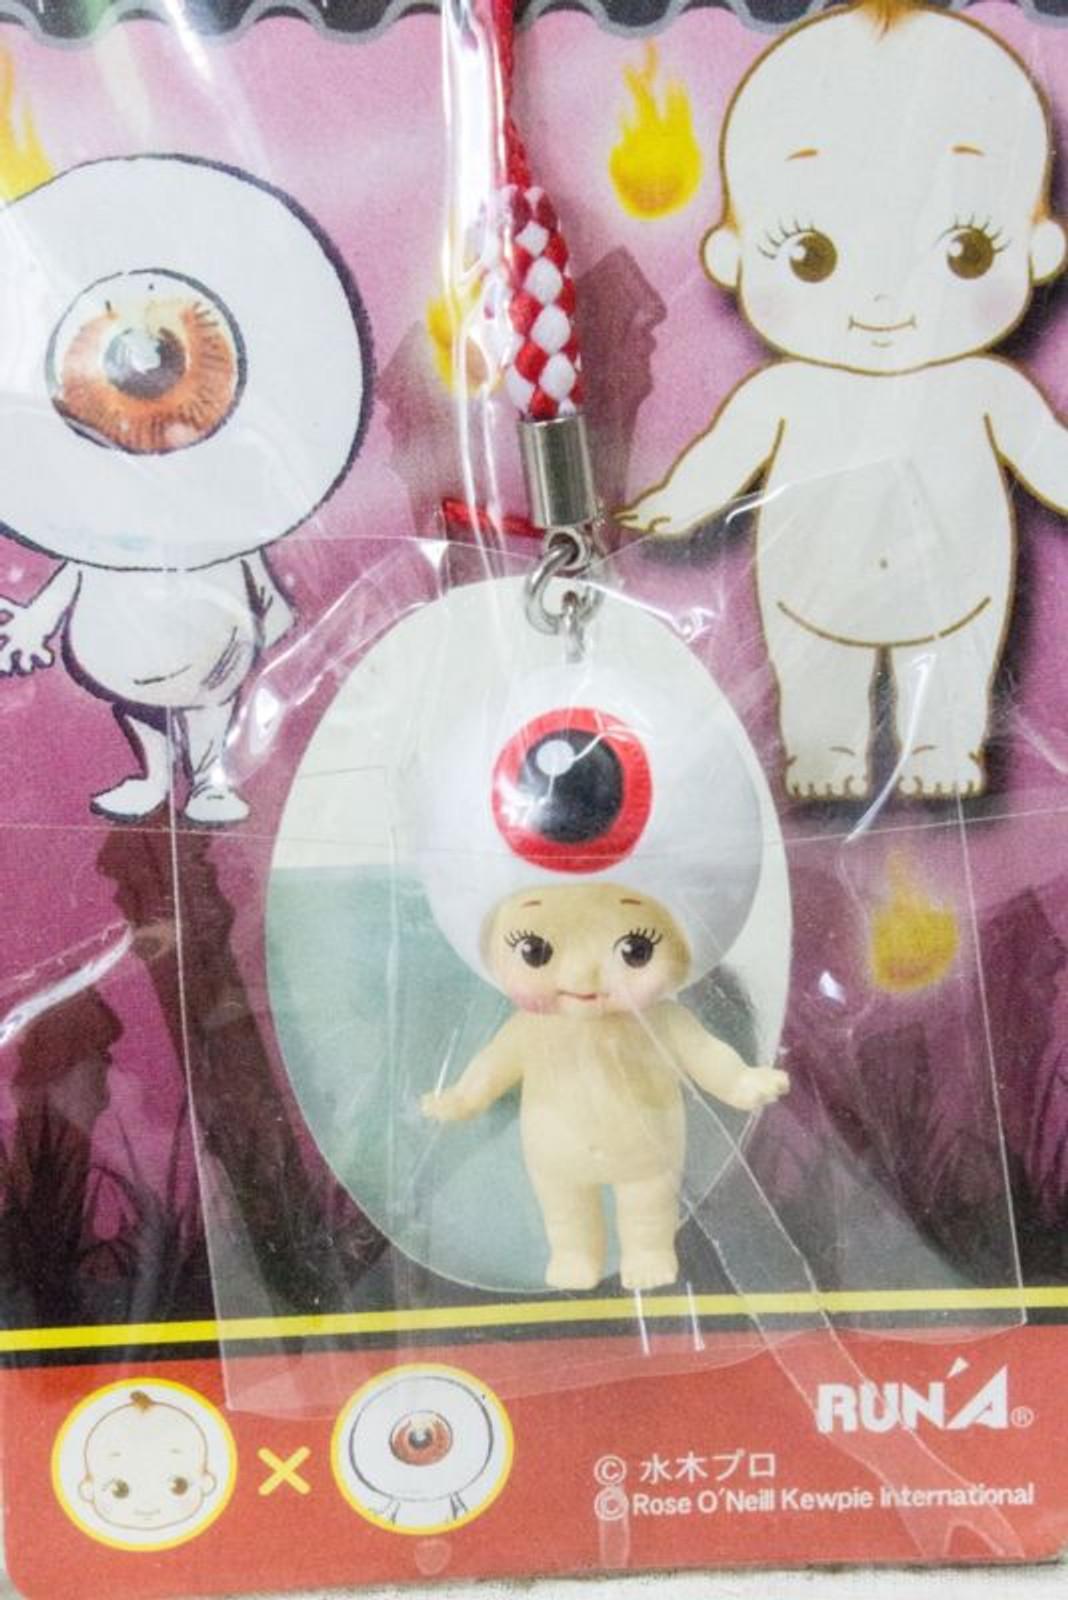 Gegege no Kitaro Medama Oyaji Rose O'neill Kewpie Kewsion Strap JAPAN ANIME